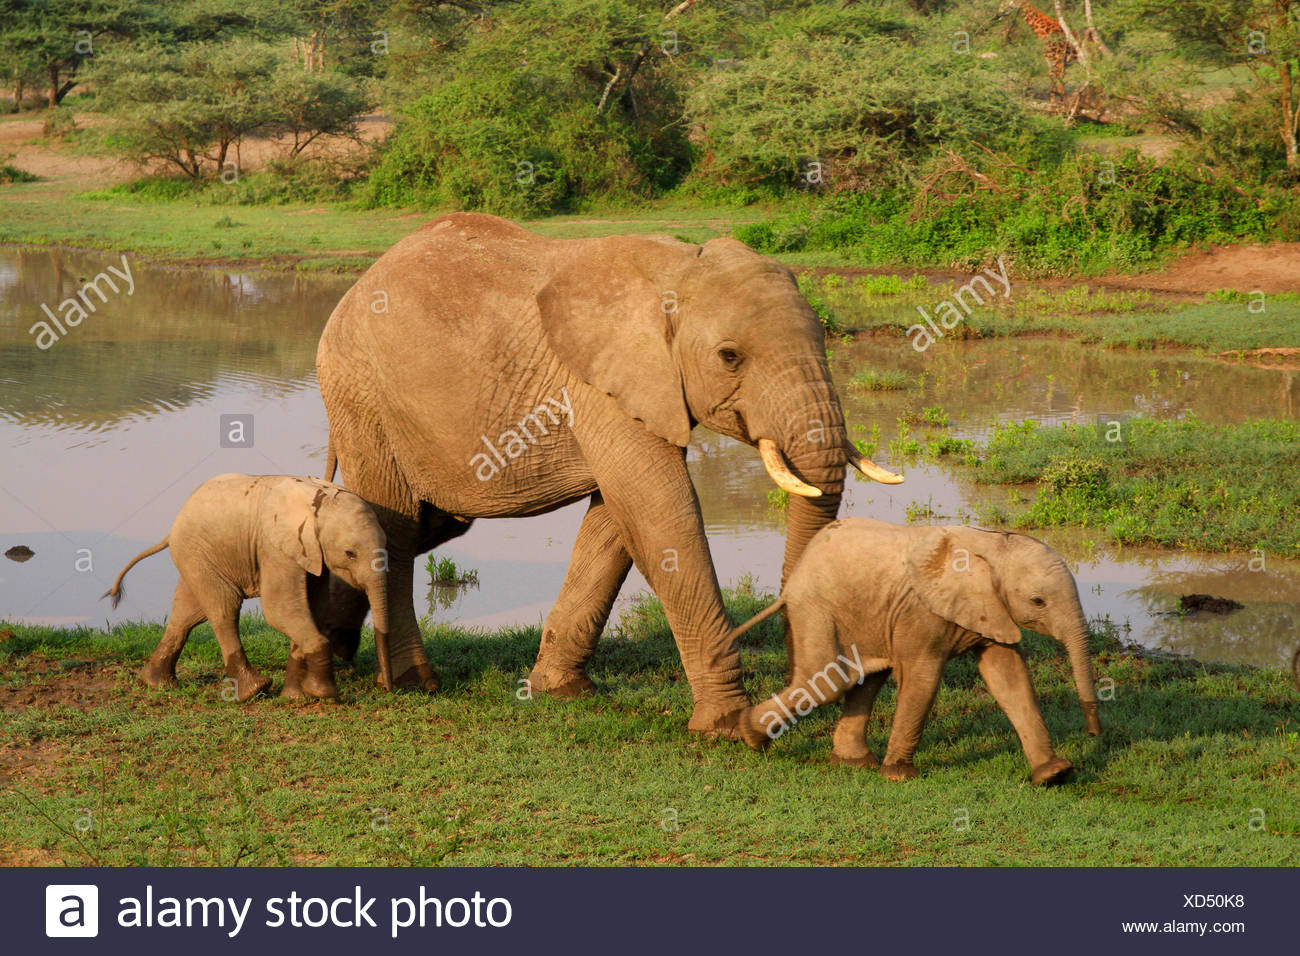 African elephant (Loxodonta africana), cow elephant with two calves at the waterhole, Tanzania, Serengeti National Park - Stock Image